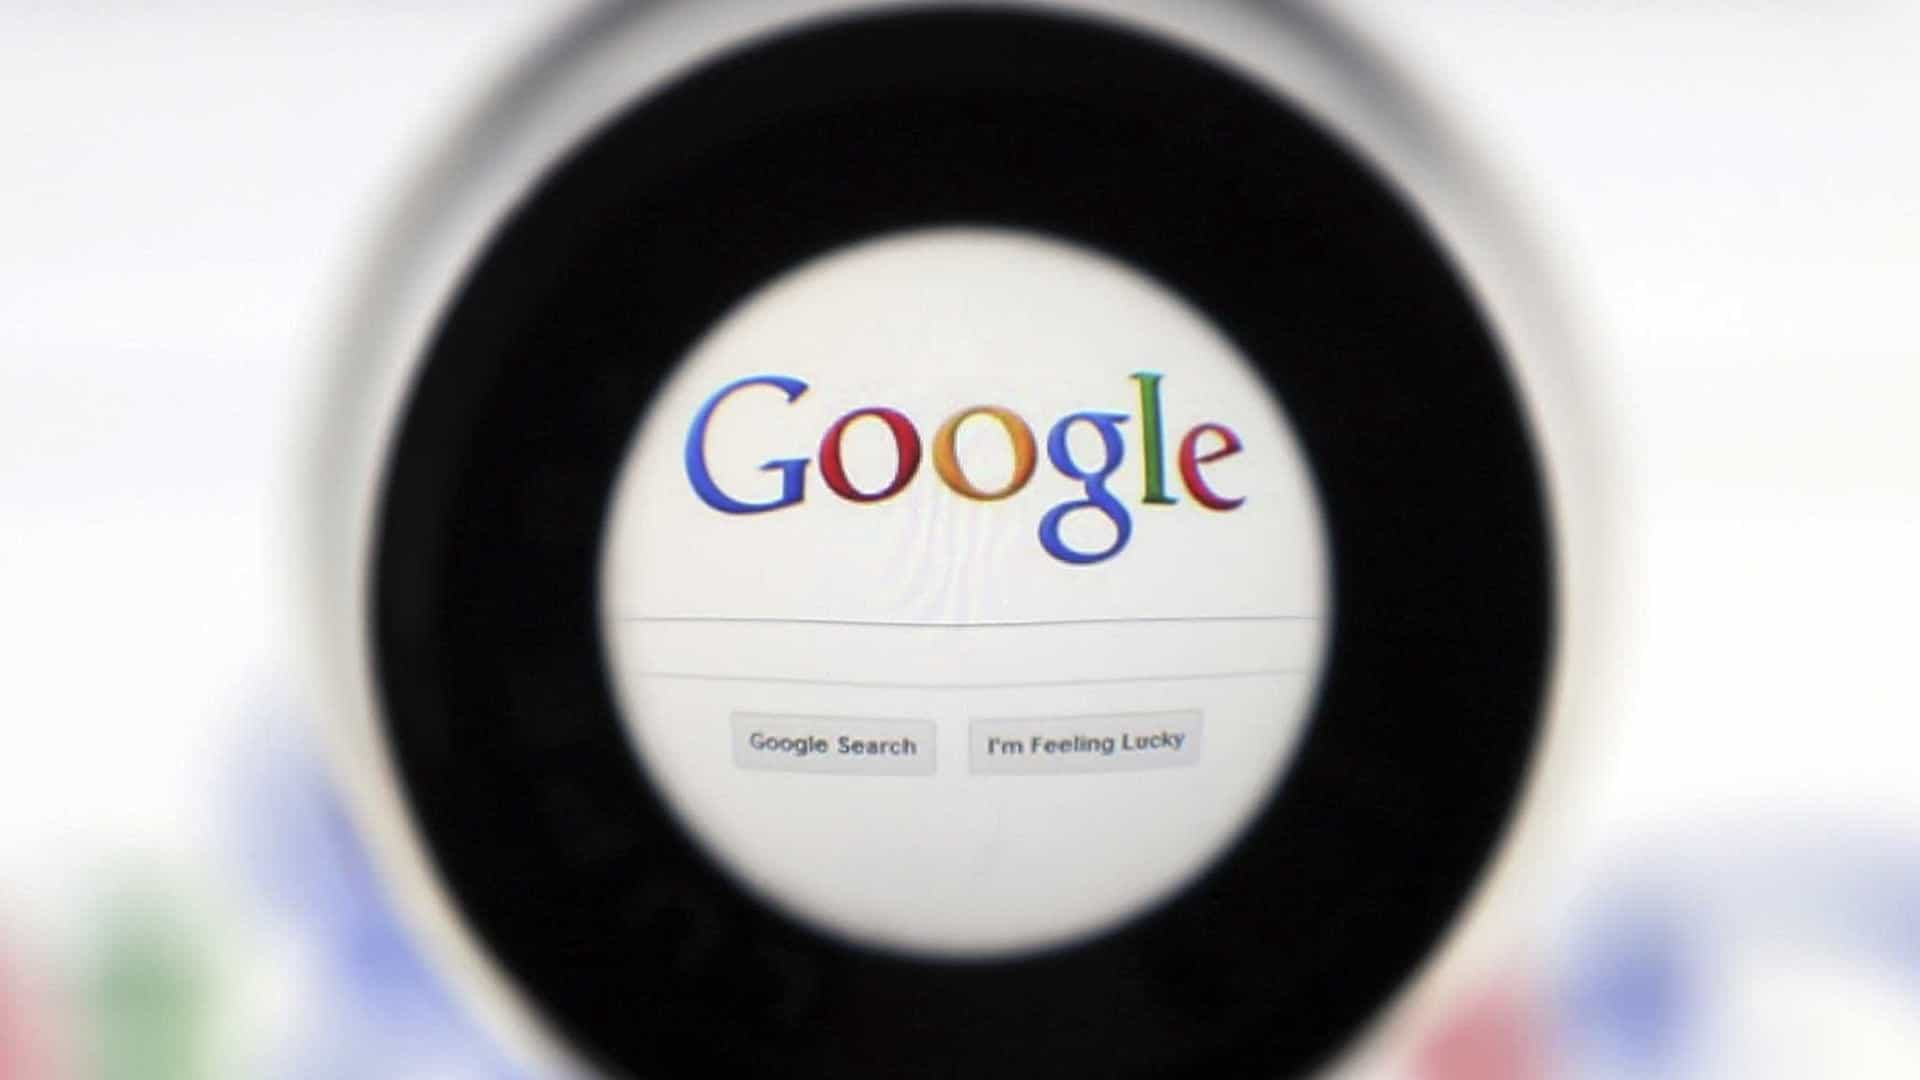 Google quer mais satélites para ampliar acesso à internet